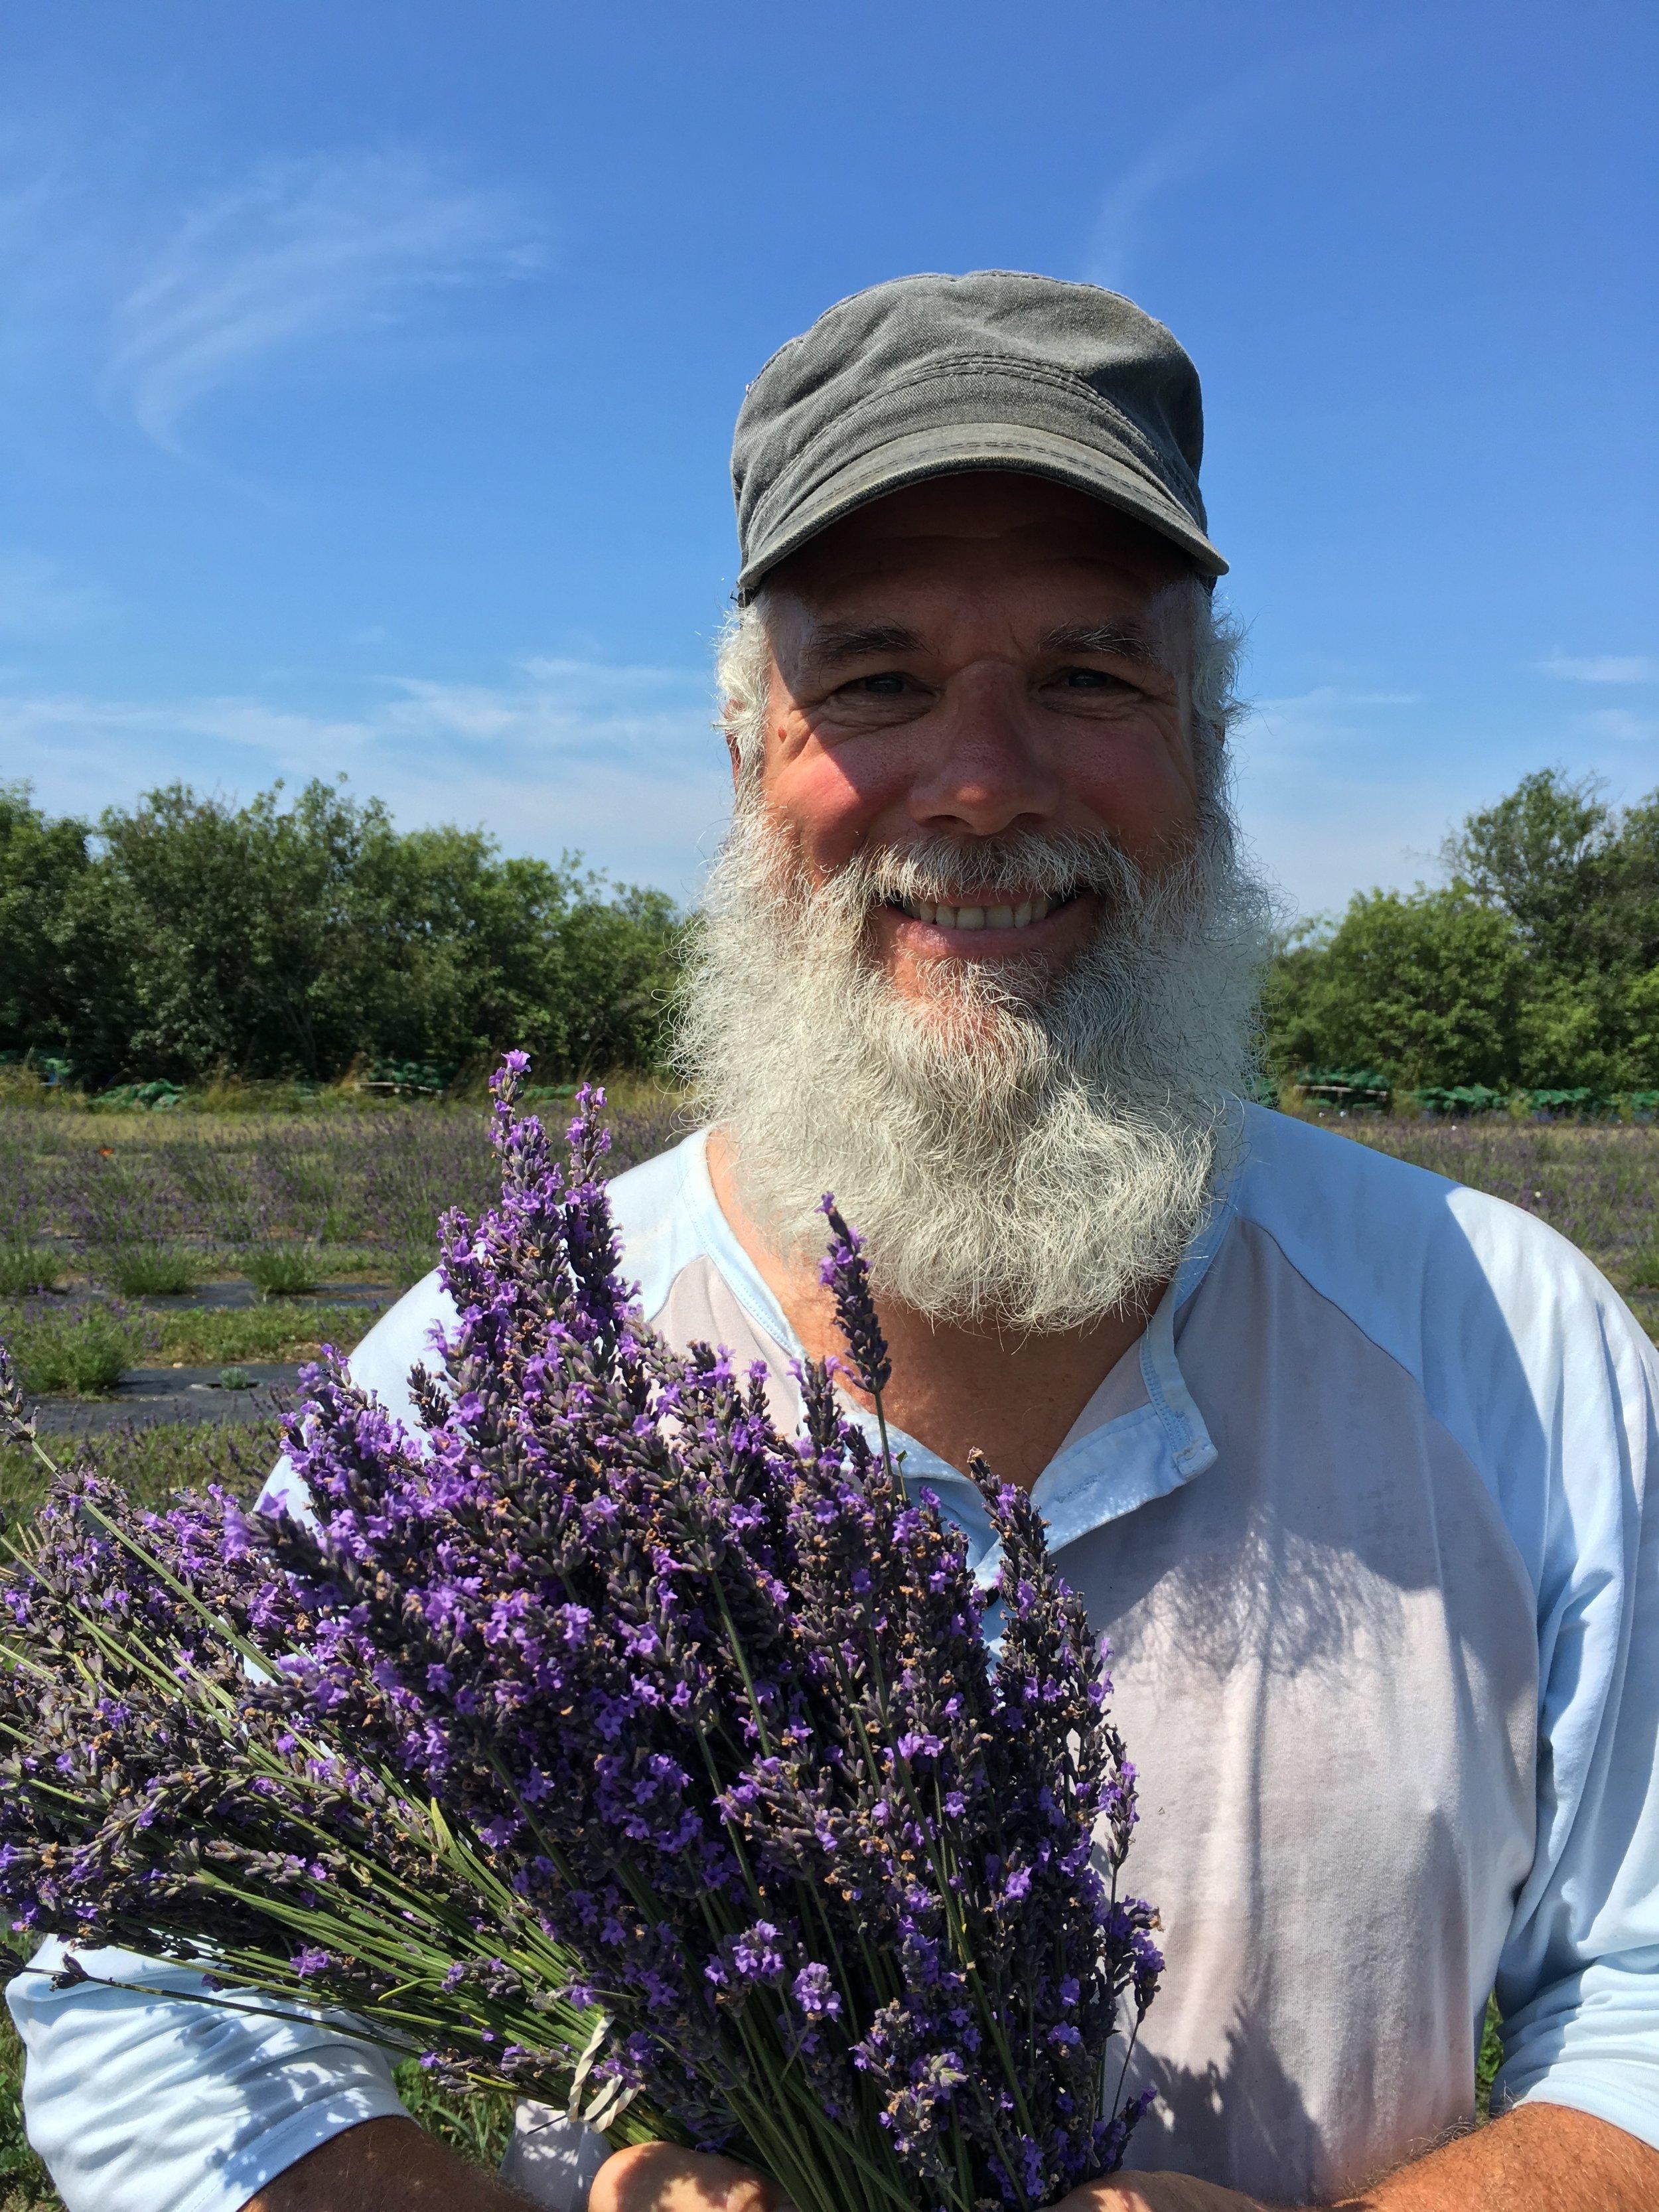 Sylvain - Head beekeeper, meadmaker, and best beard in the business.